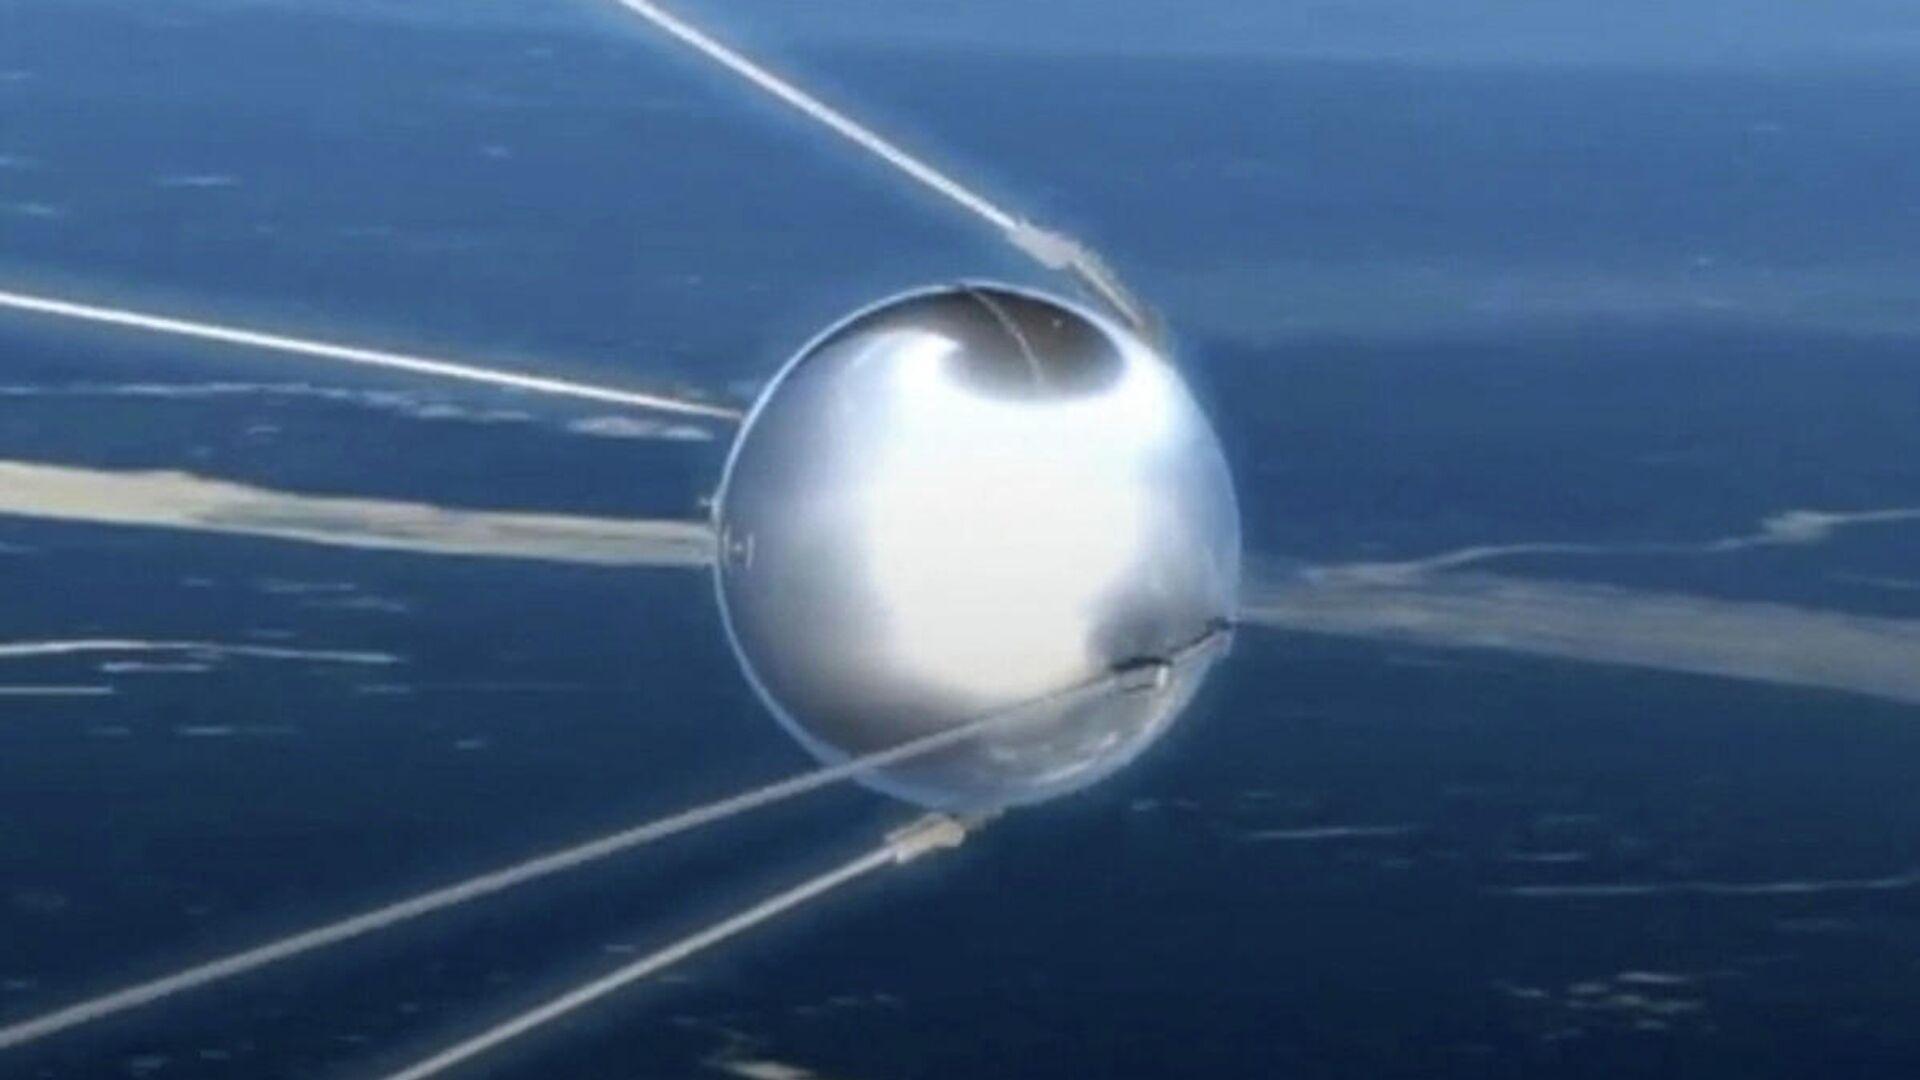 Sputnik 1: Η συναρπαστική ιστορία του πρώτου τεχνητού δορυφόρου στο διάστημα - Sputnik Ελλάδα, 1920, 09.10.2021